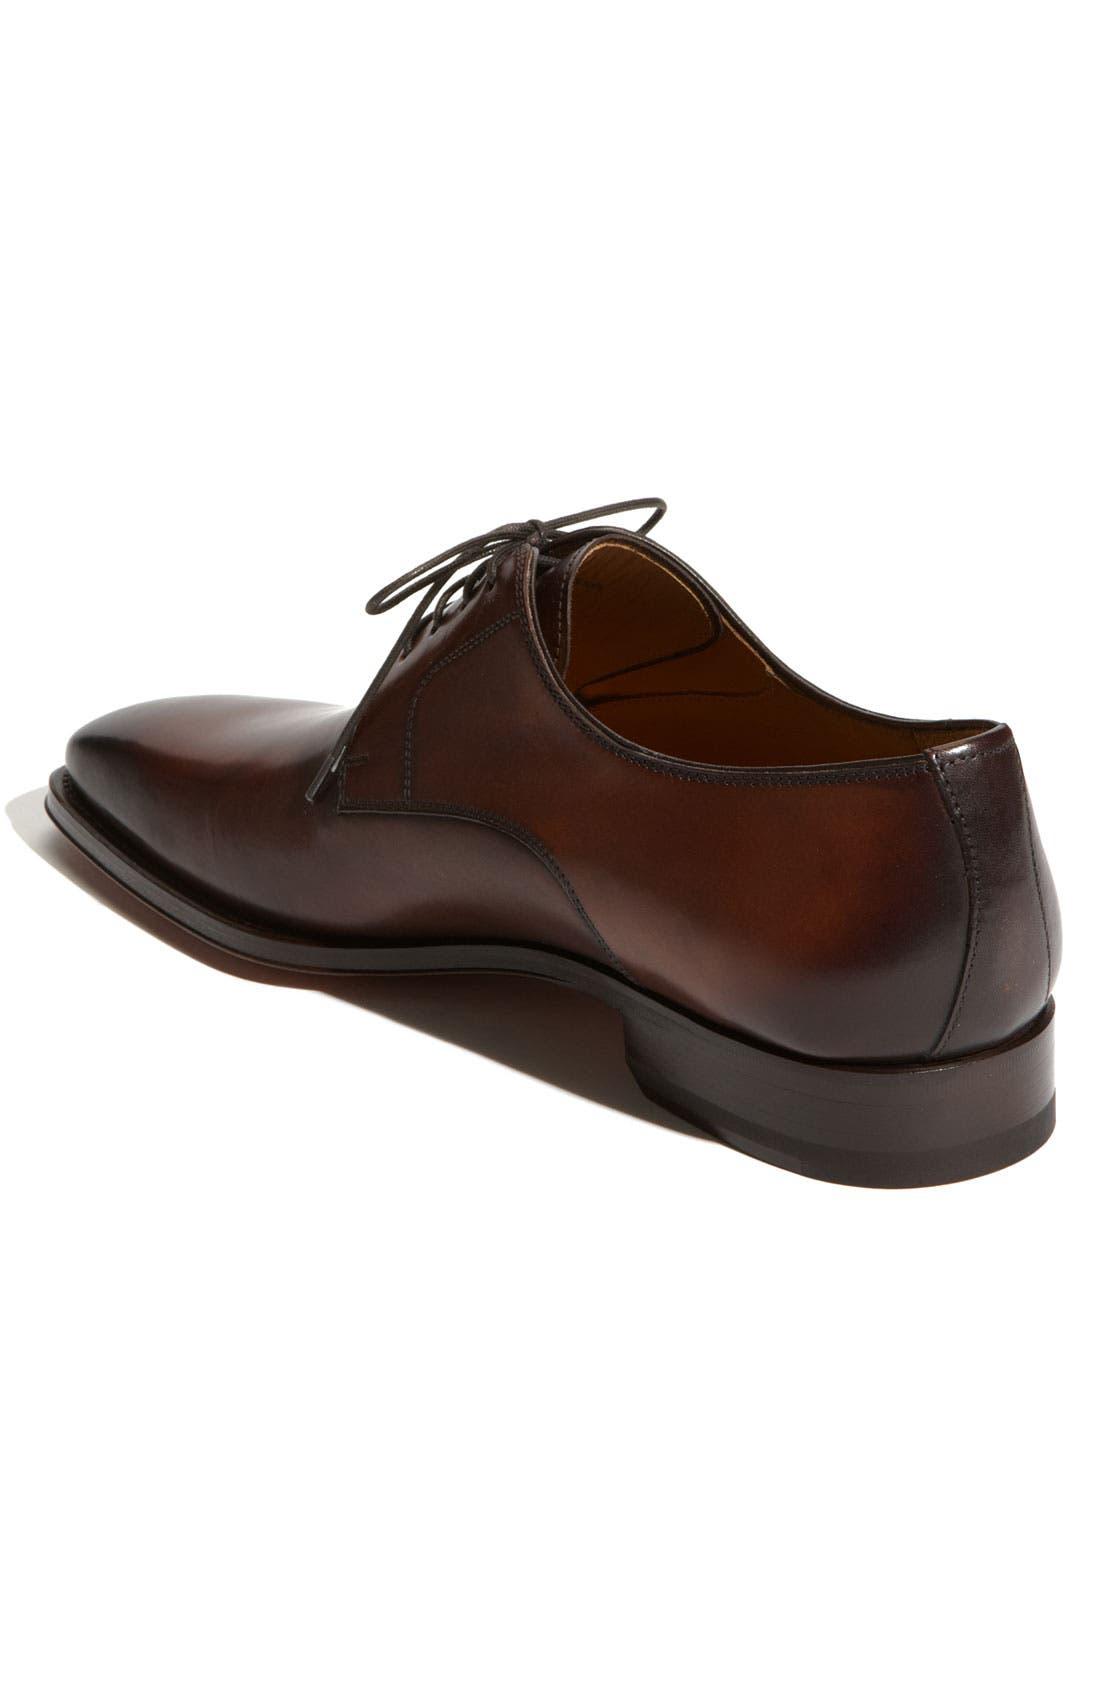 Alternate Image 2  - Magnanni 'Colo' Plain Toe Derby (Men)